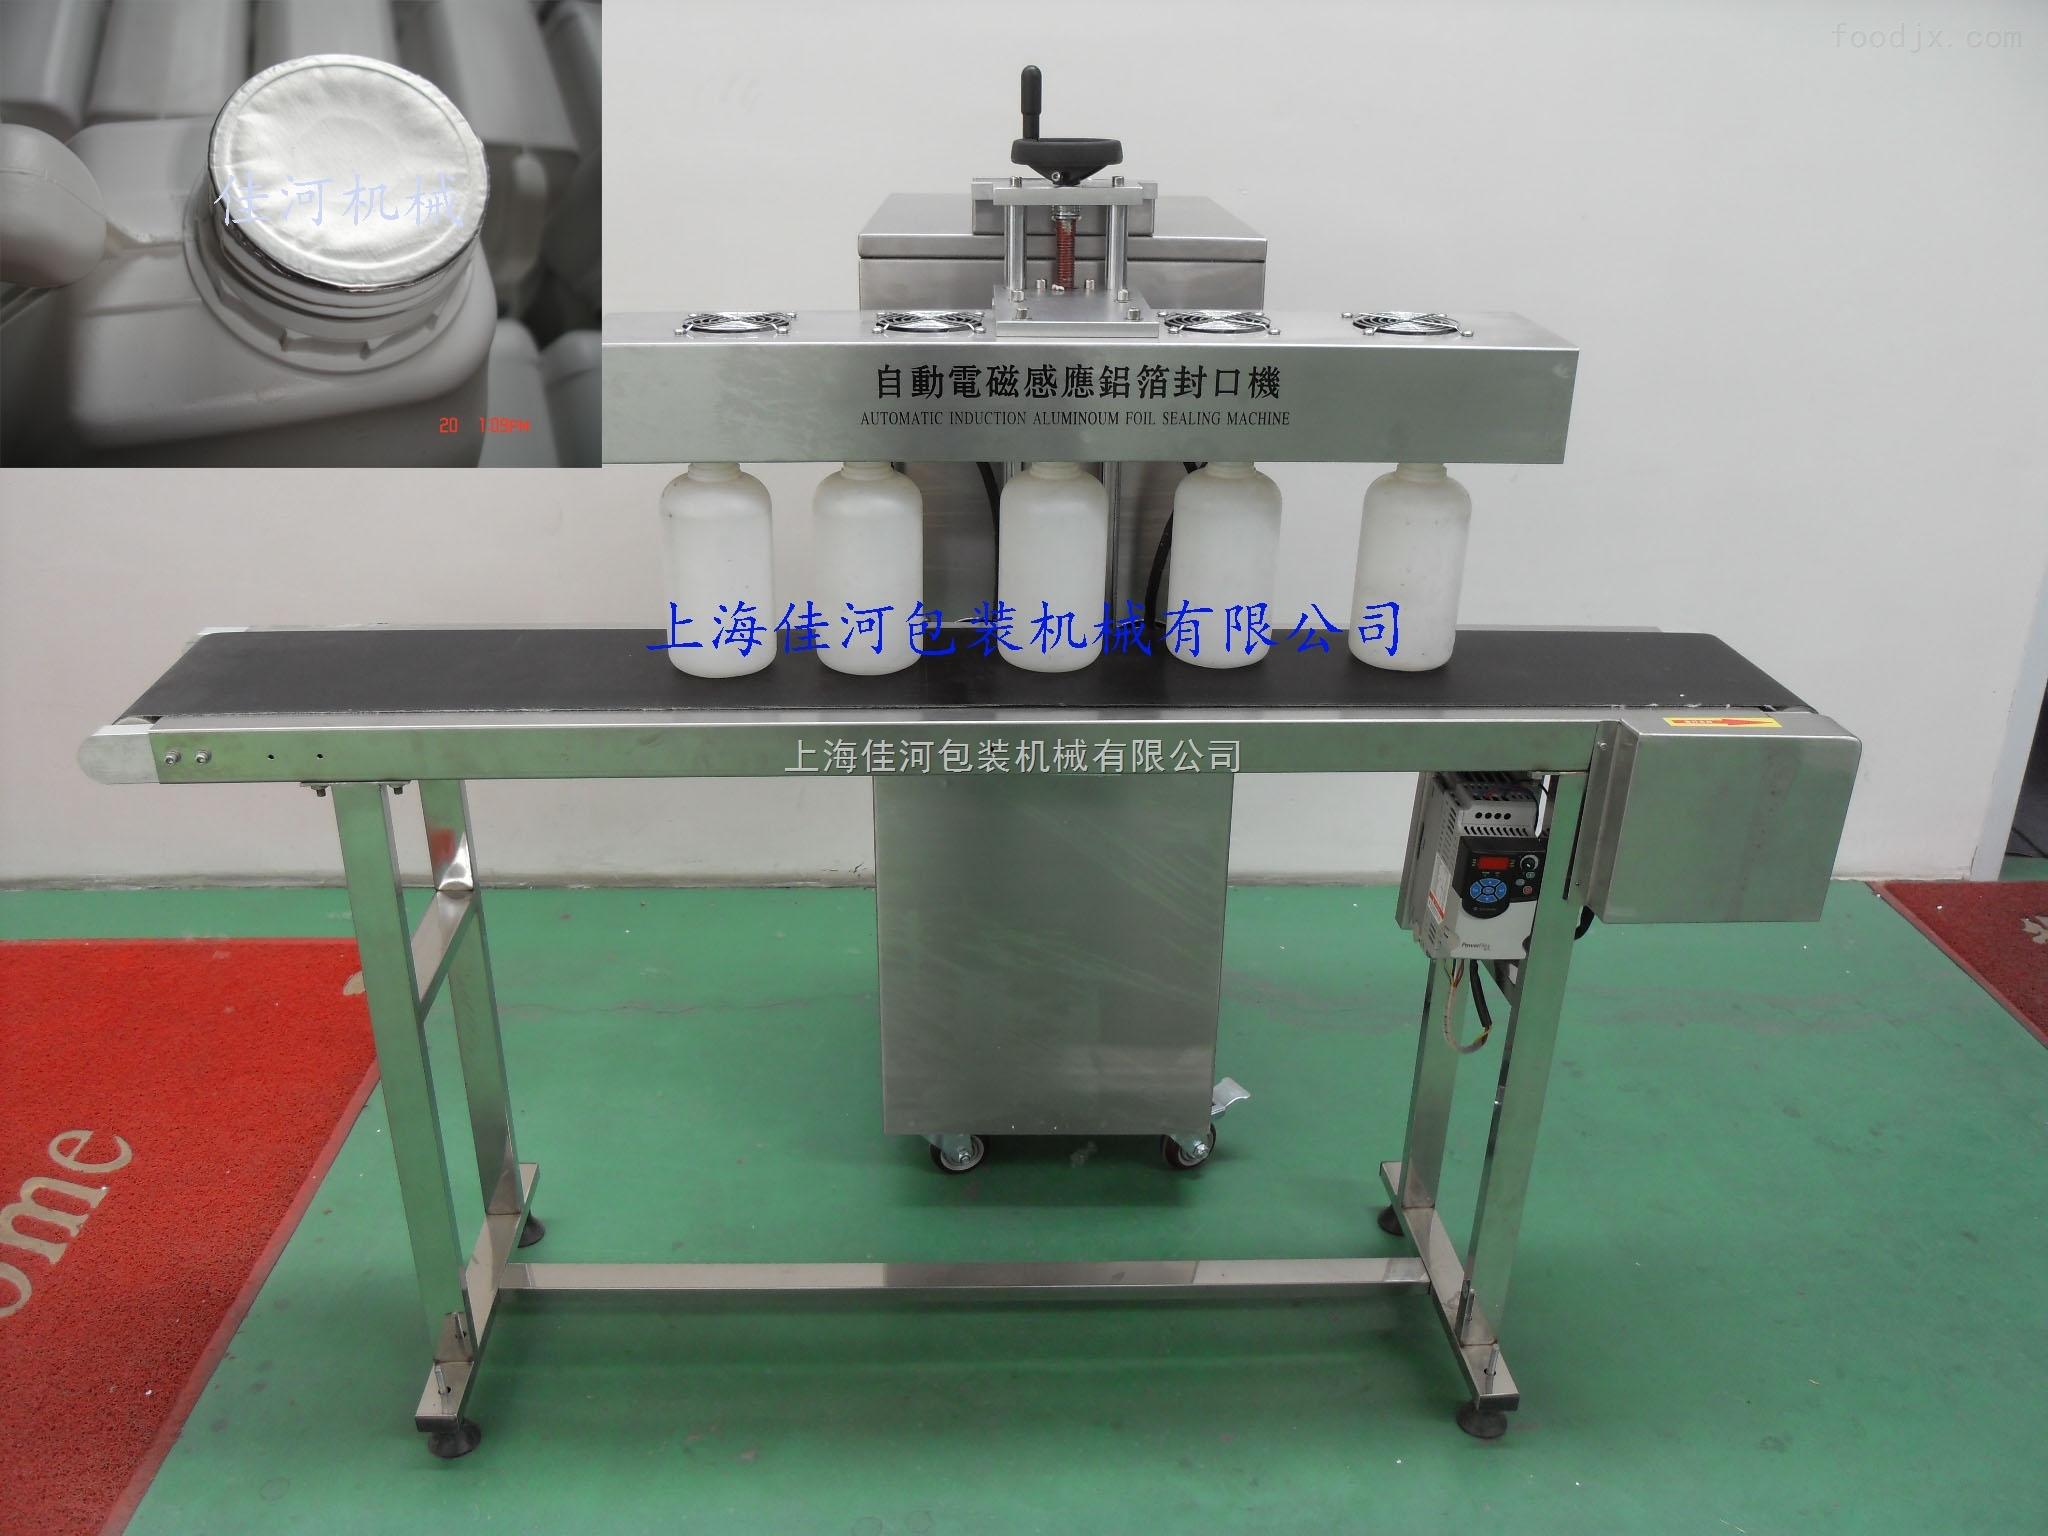 GLF-2300厂家直销   GLF-2300   自动超大口径  电磁感应铝箔封口机   药瓶封口机 塑料瓶